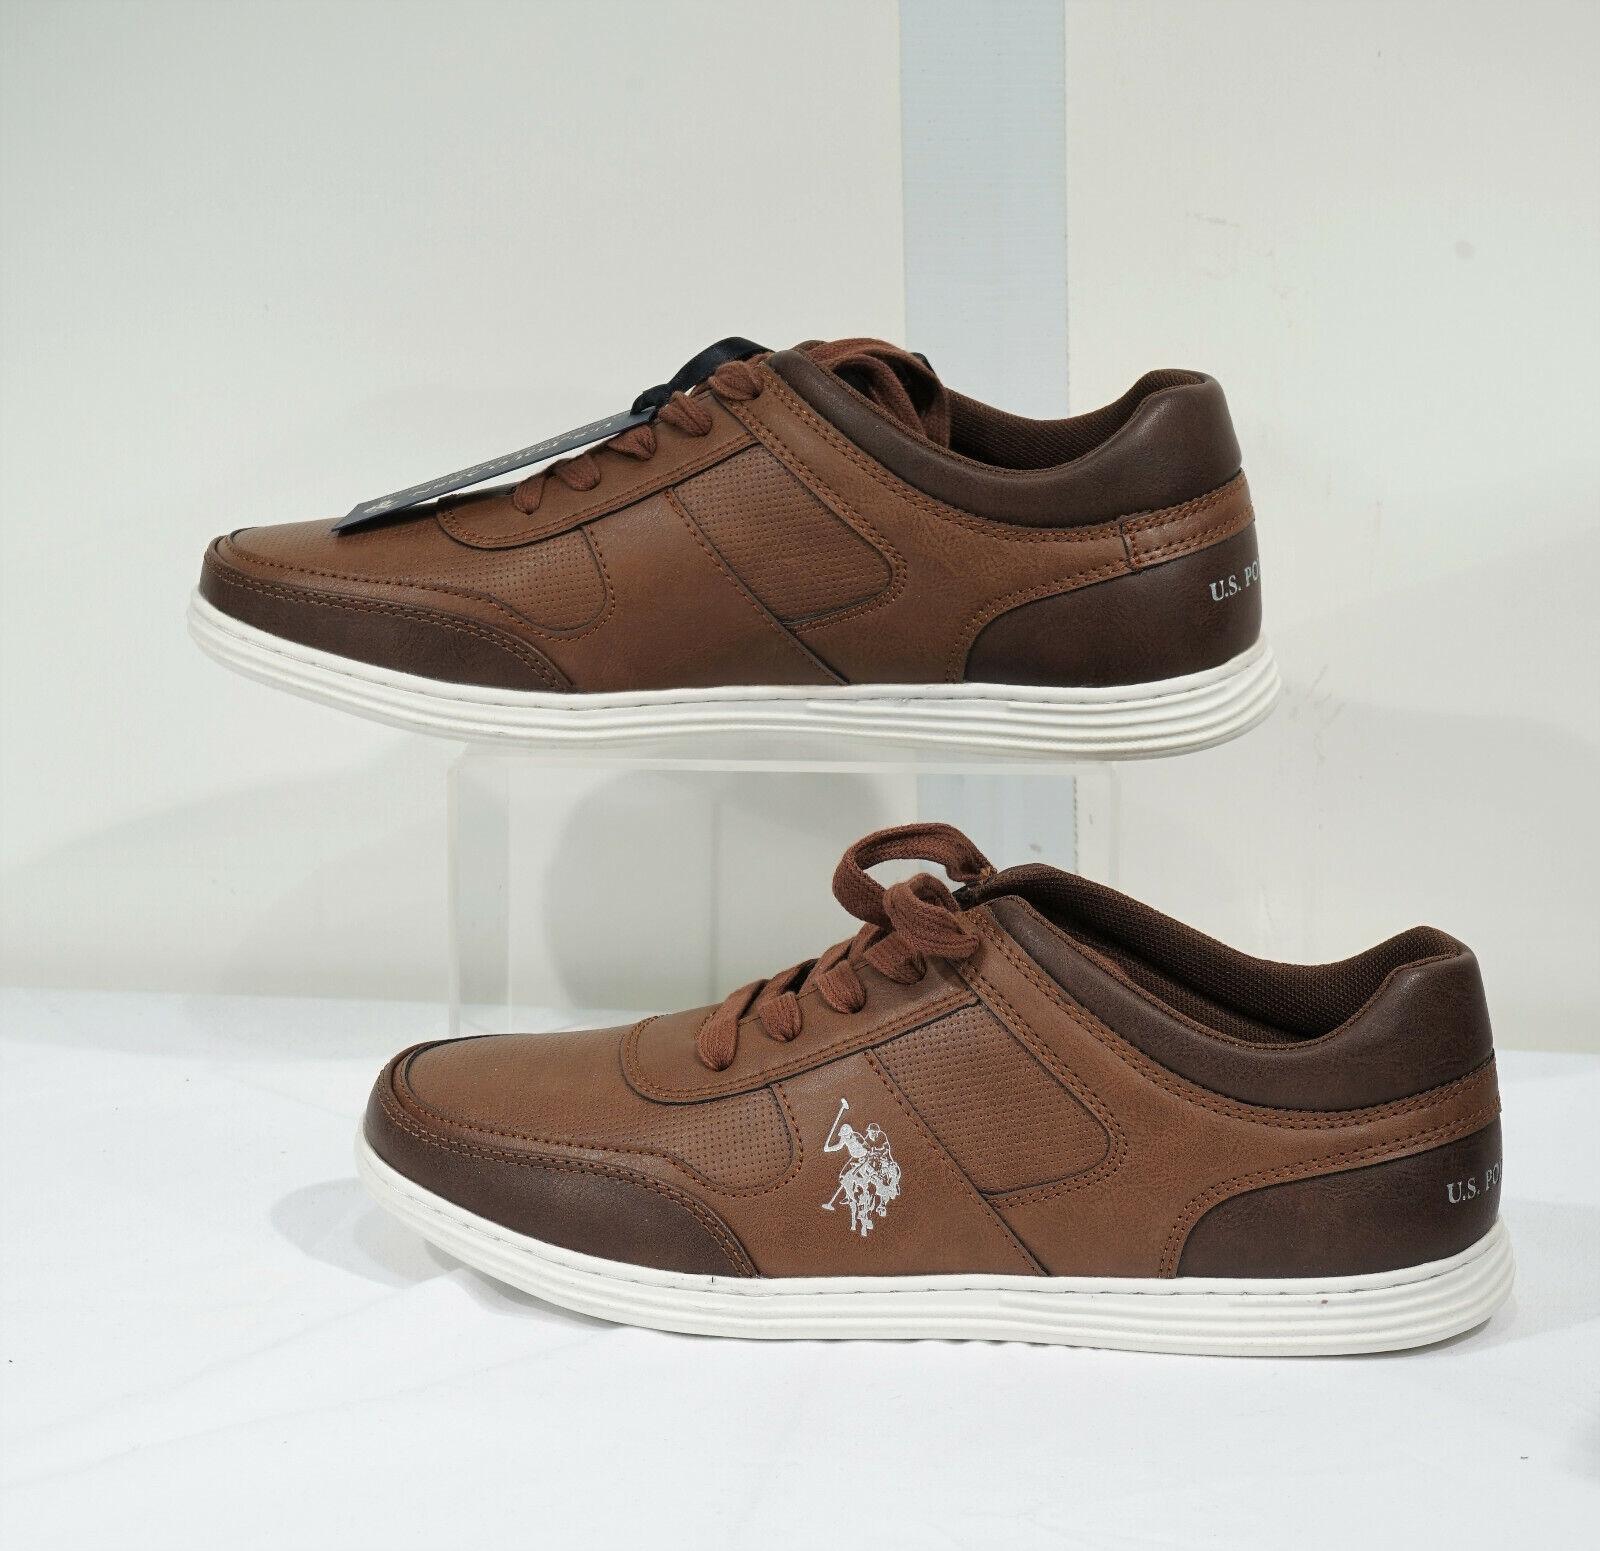 NIB US Polo Assn Chocolate Brown 'Slugger' Lace Up Sneaker Sz 10.5 M